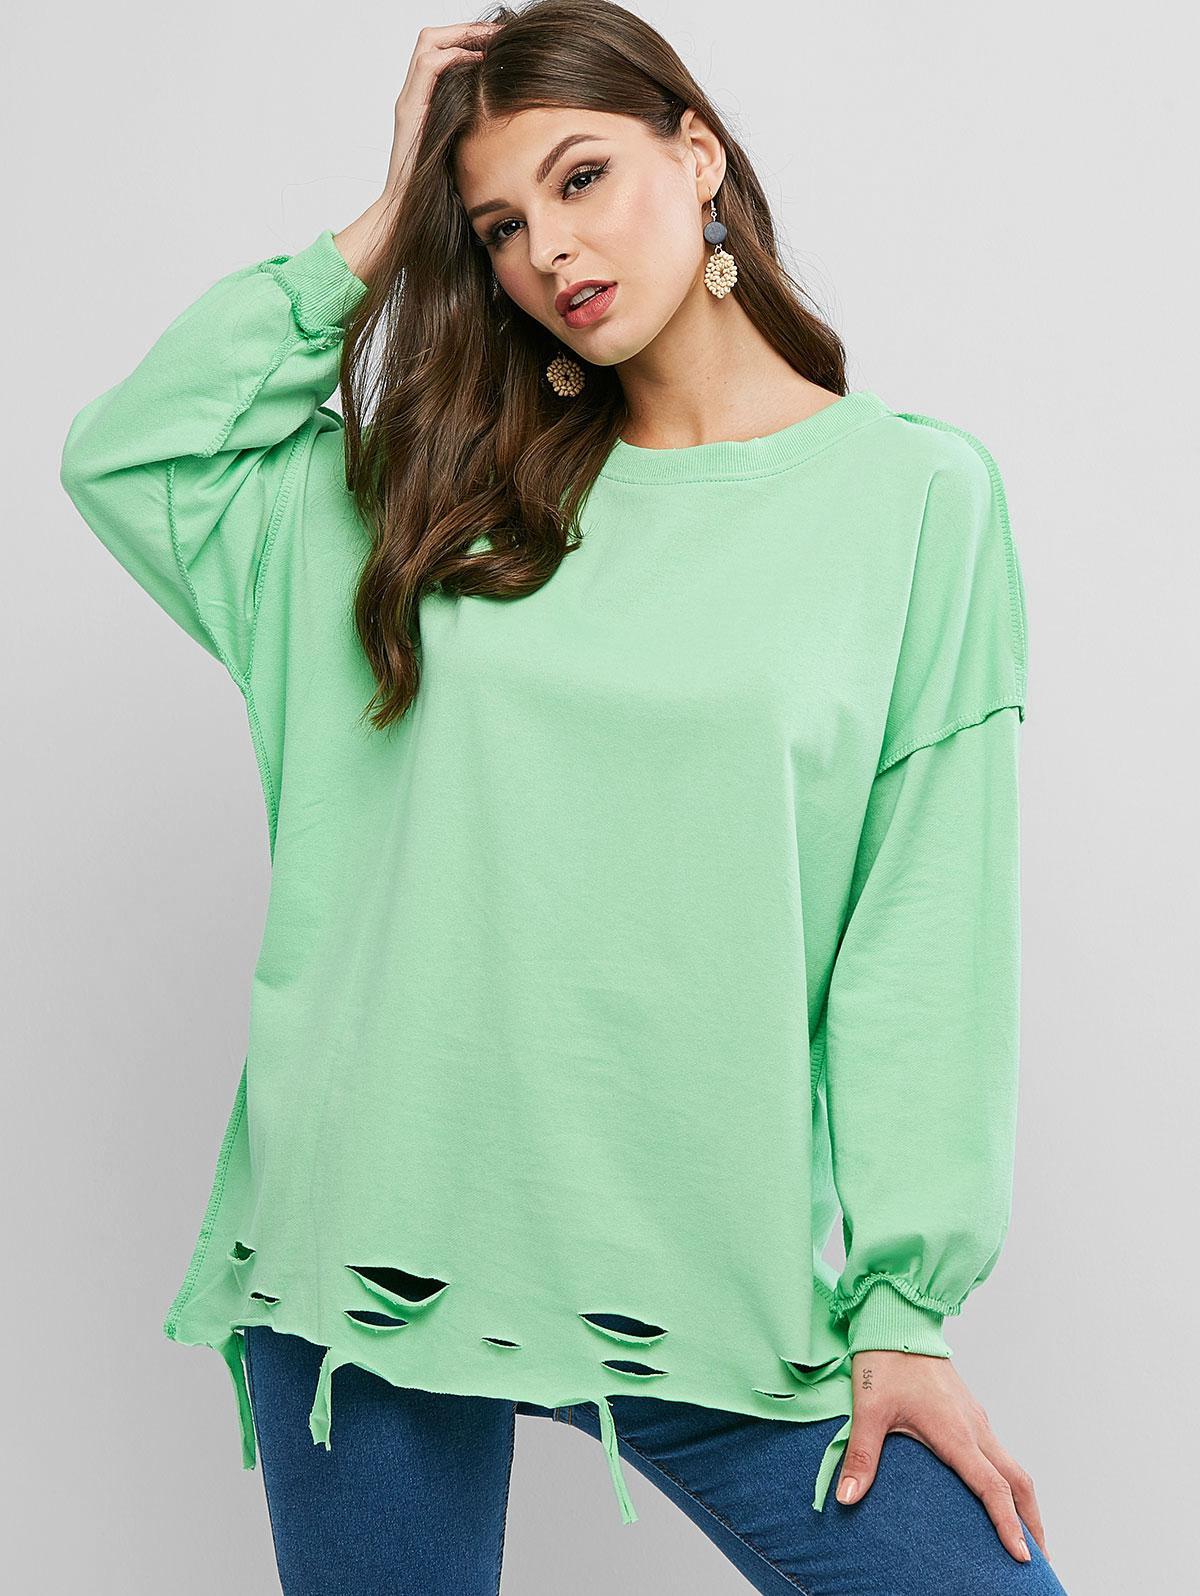 Ripped Drop Shoulder Oversized Raw Cut Tunic Sweatshirt